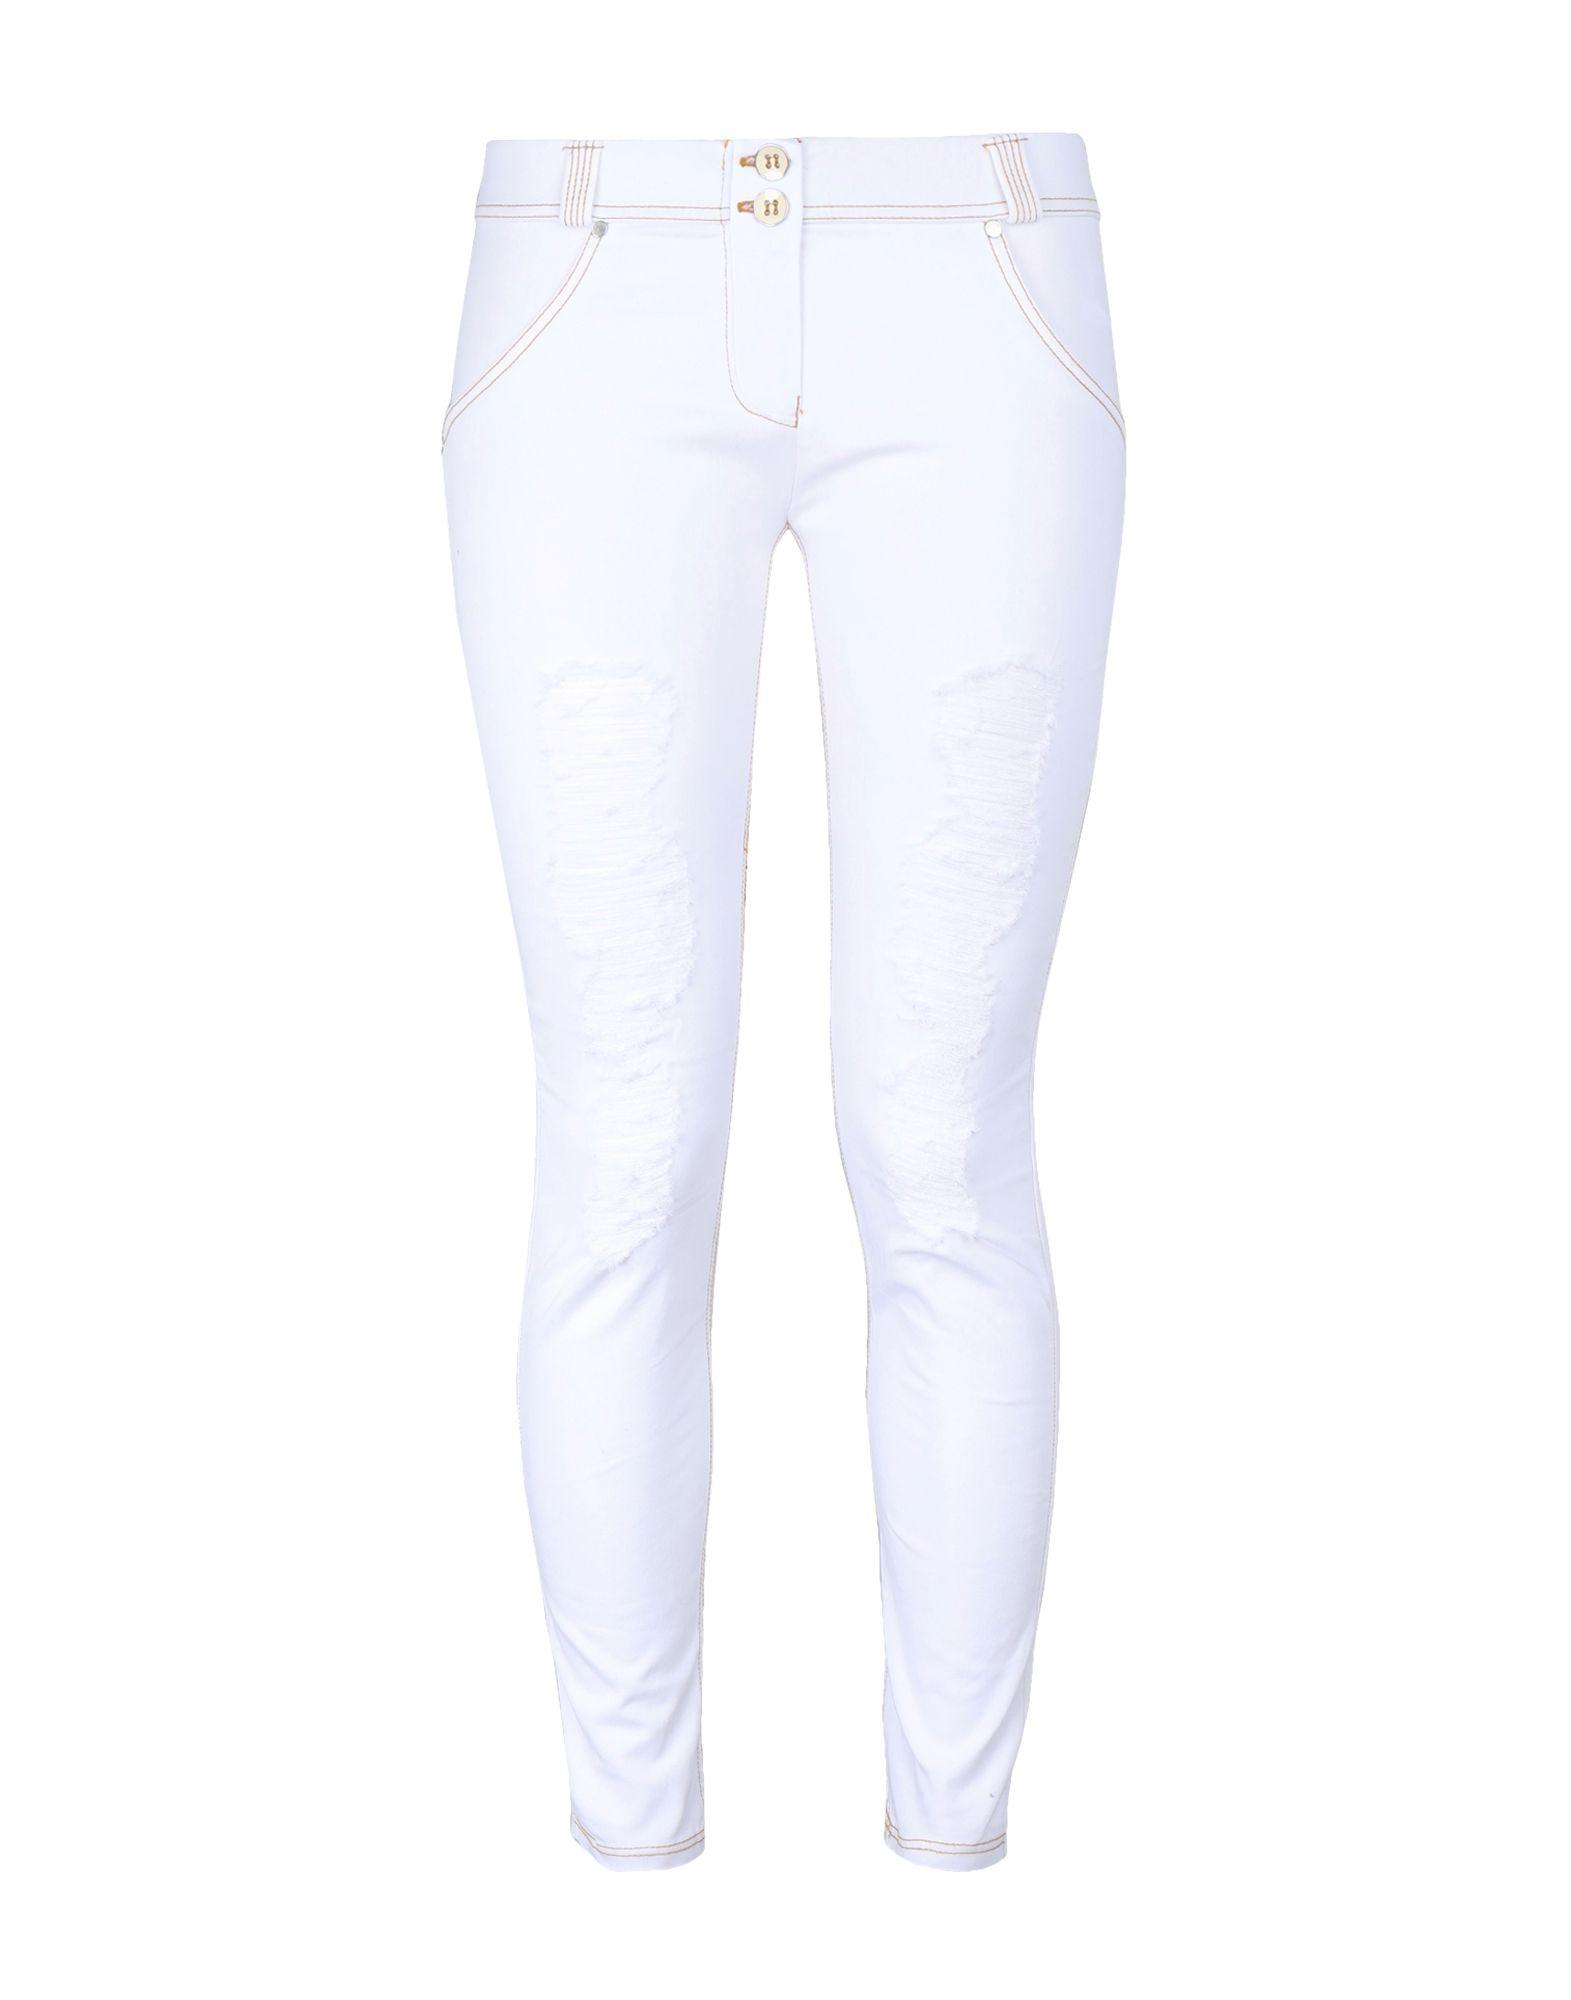 rivenditore online 6850e 0fea5 Pantaloni Jeans Freddy Wr.Up Evolution Pack - Donna ...